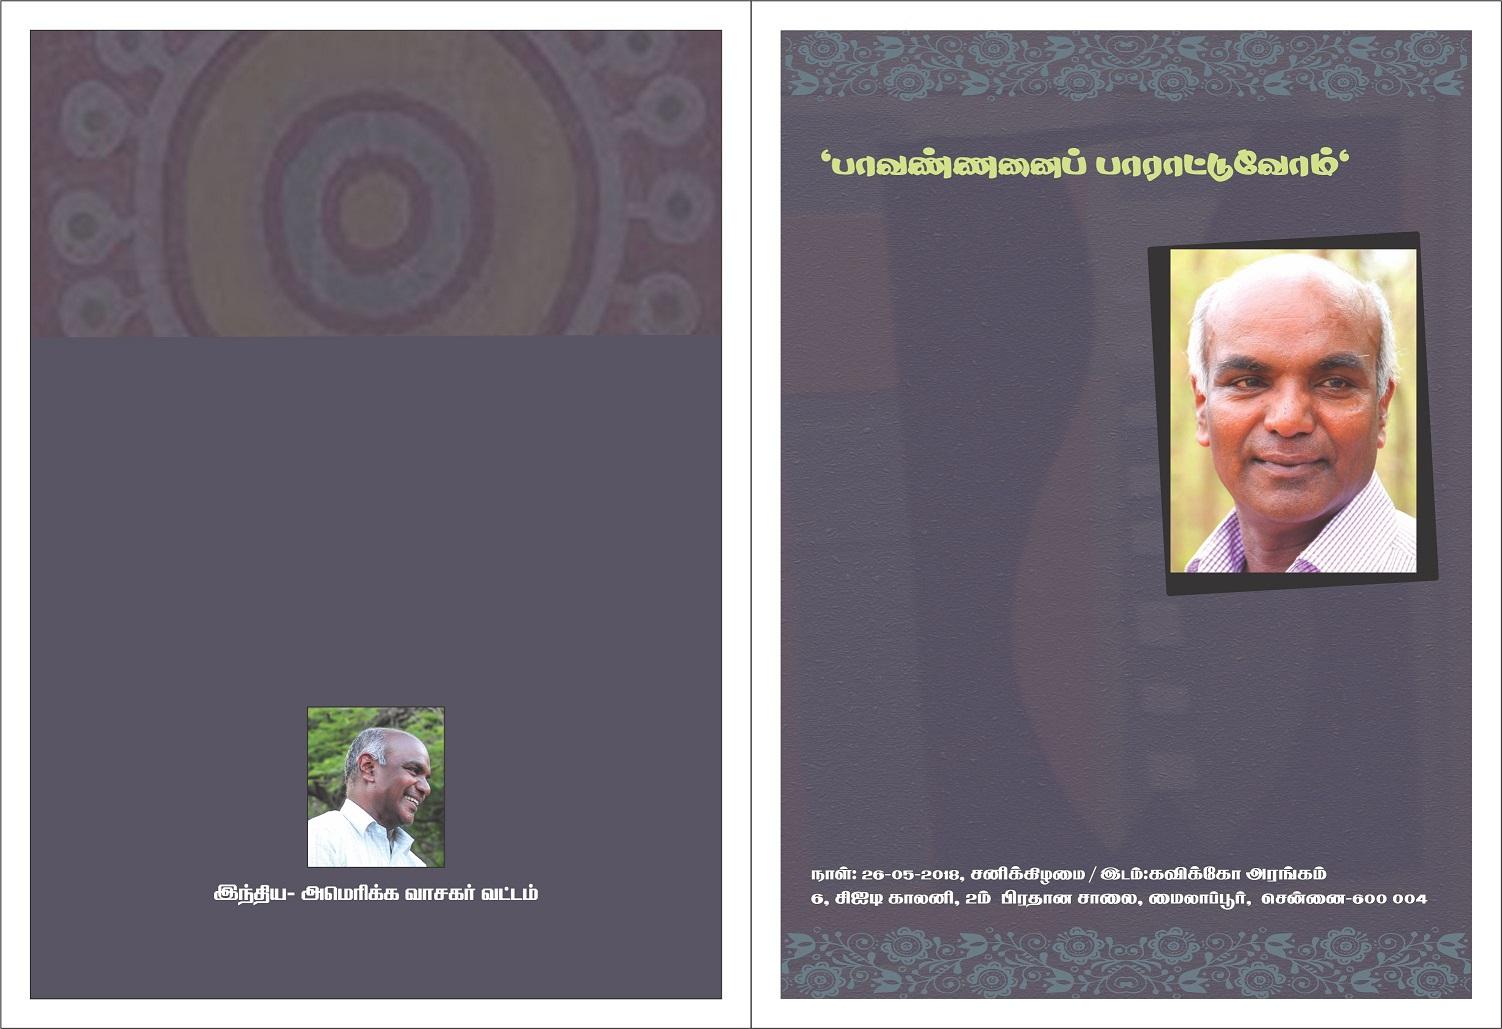 Paavannan-invite-front-n-back (1)